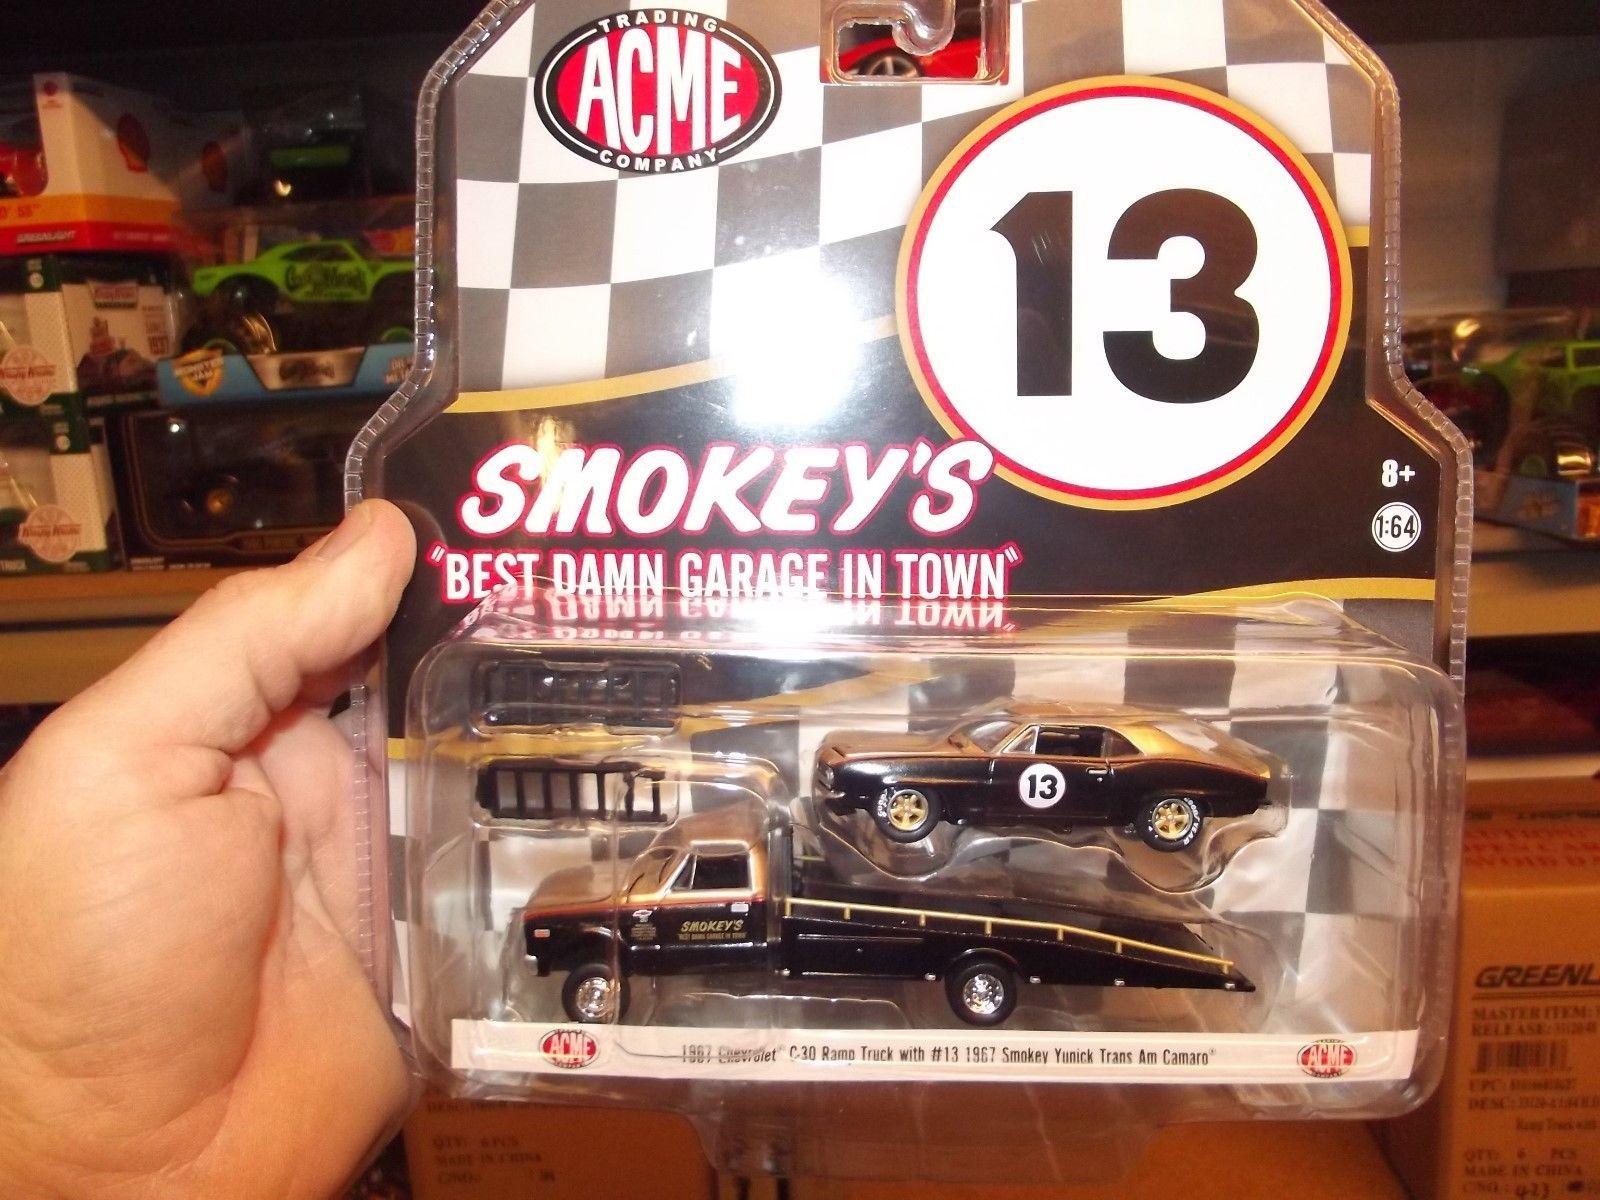 Cars Trucks and Vans 180273: Acme Hd 1 64 1967 C30 Ramp